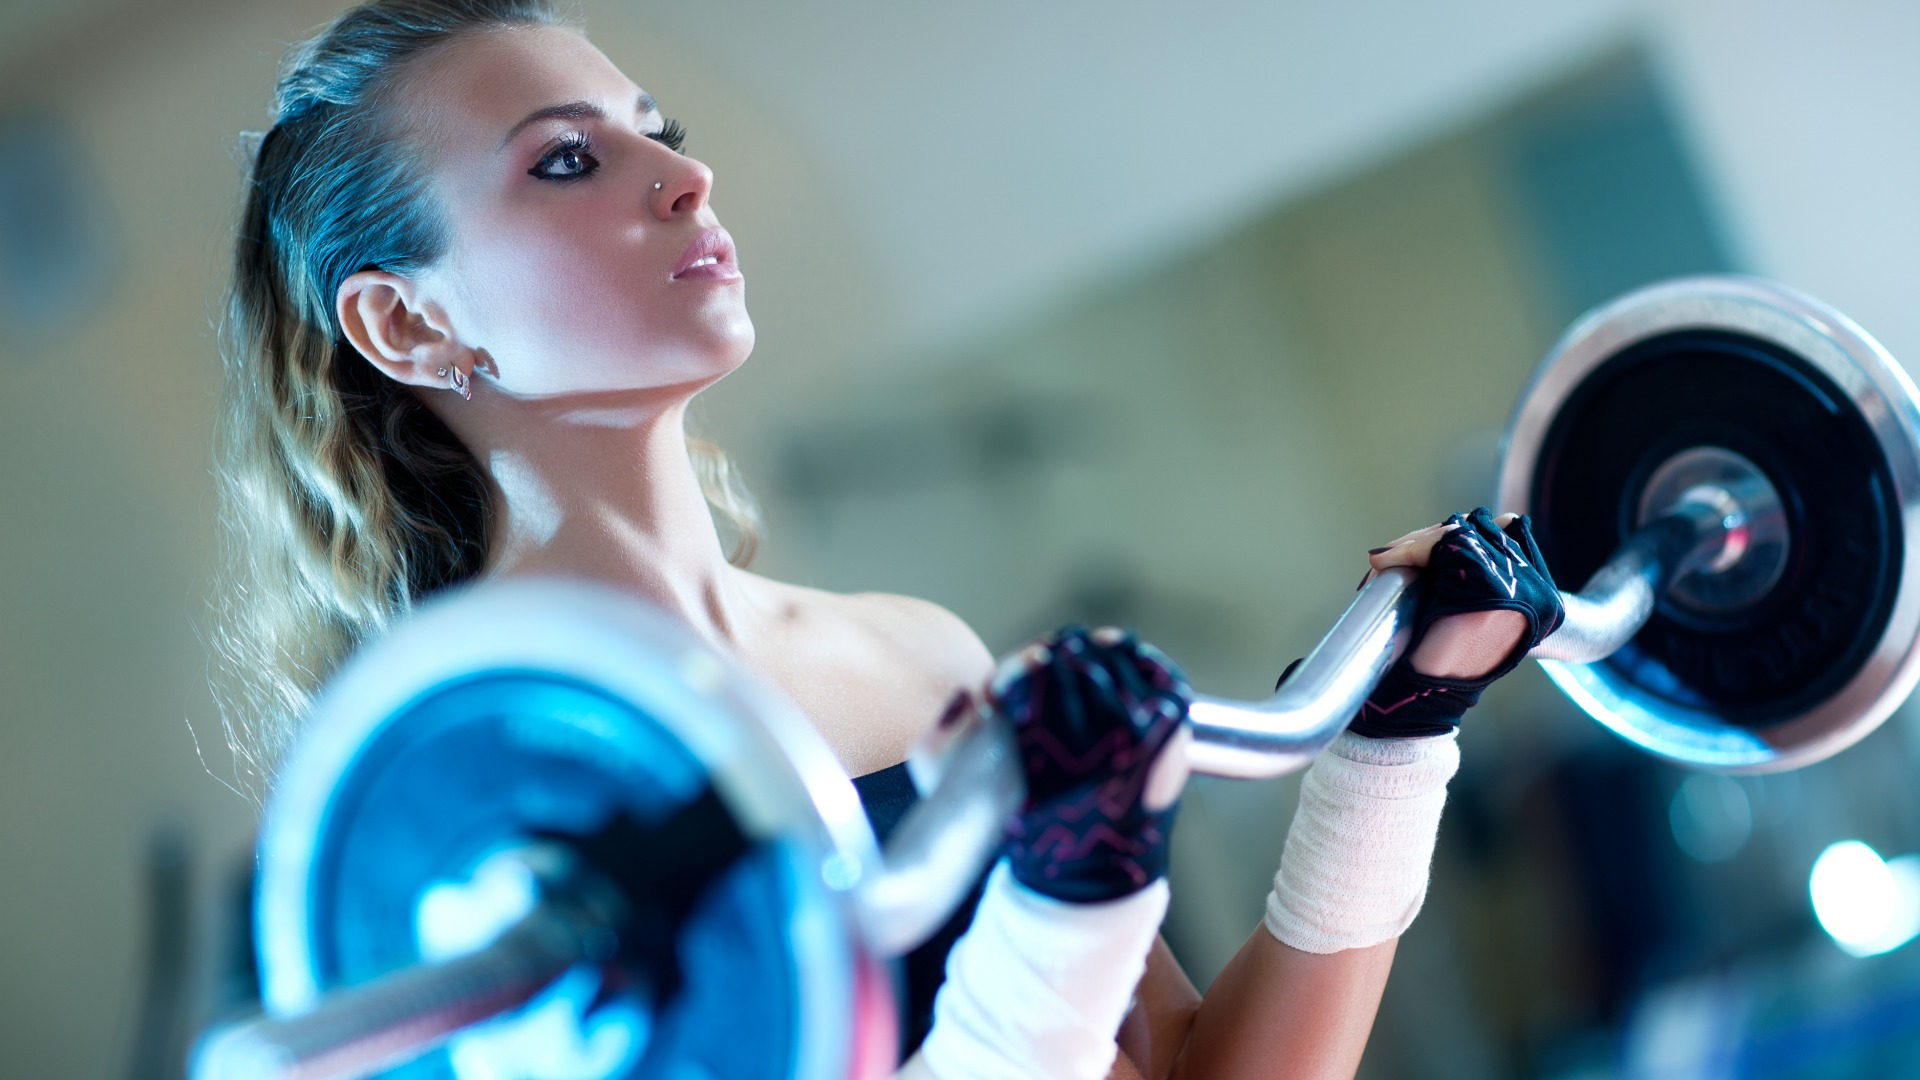 47 gym wallpaper hd on wallpapersafari - Wallpaper fitness women ...